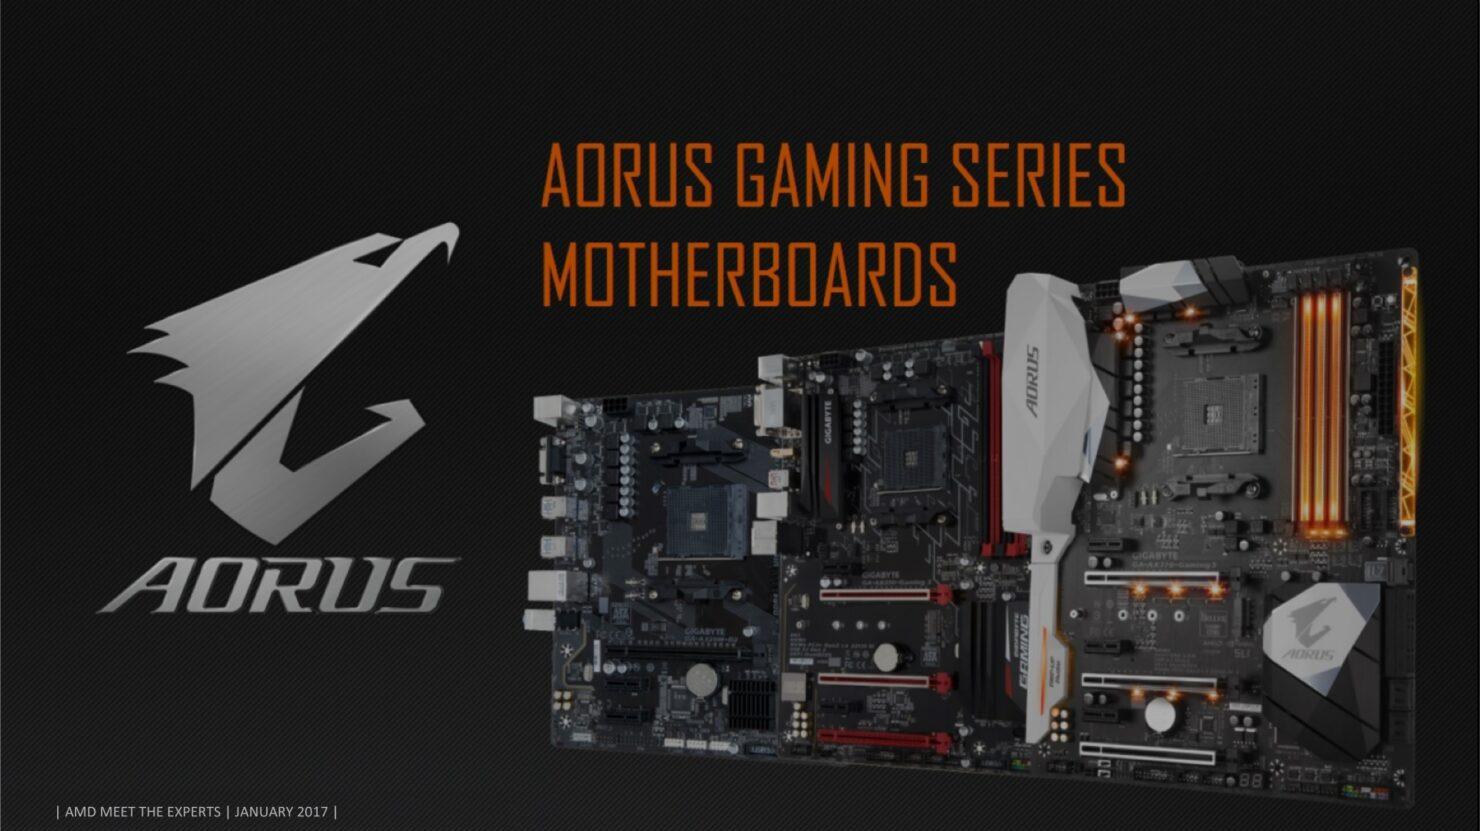 gigabyte-aorus-am4-motherboards_1